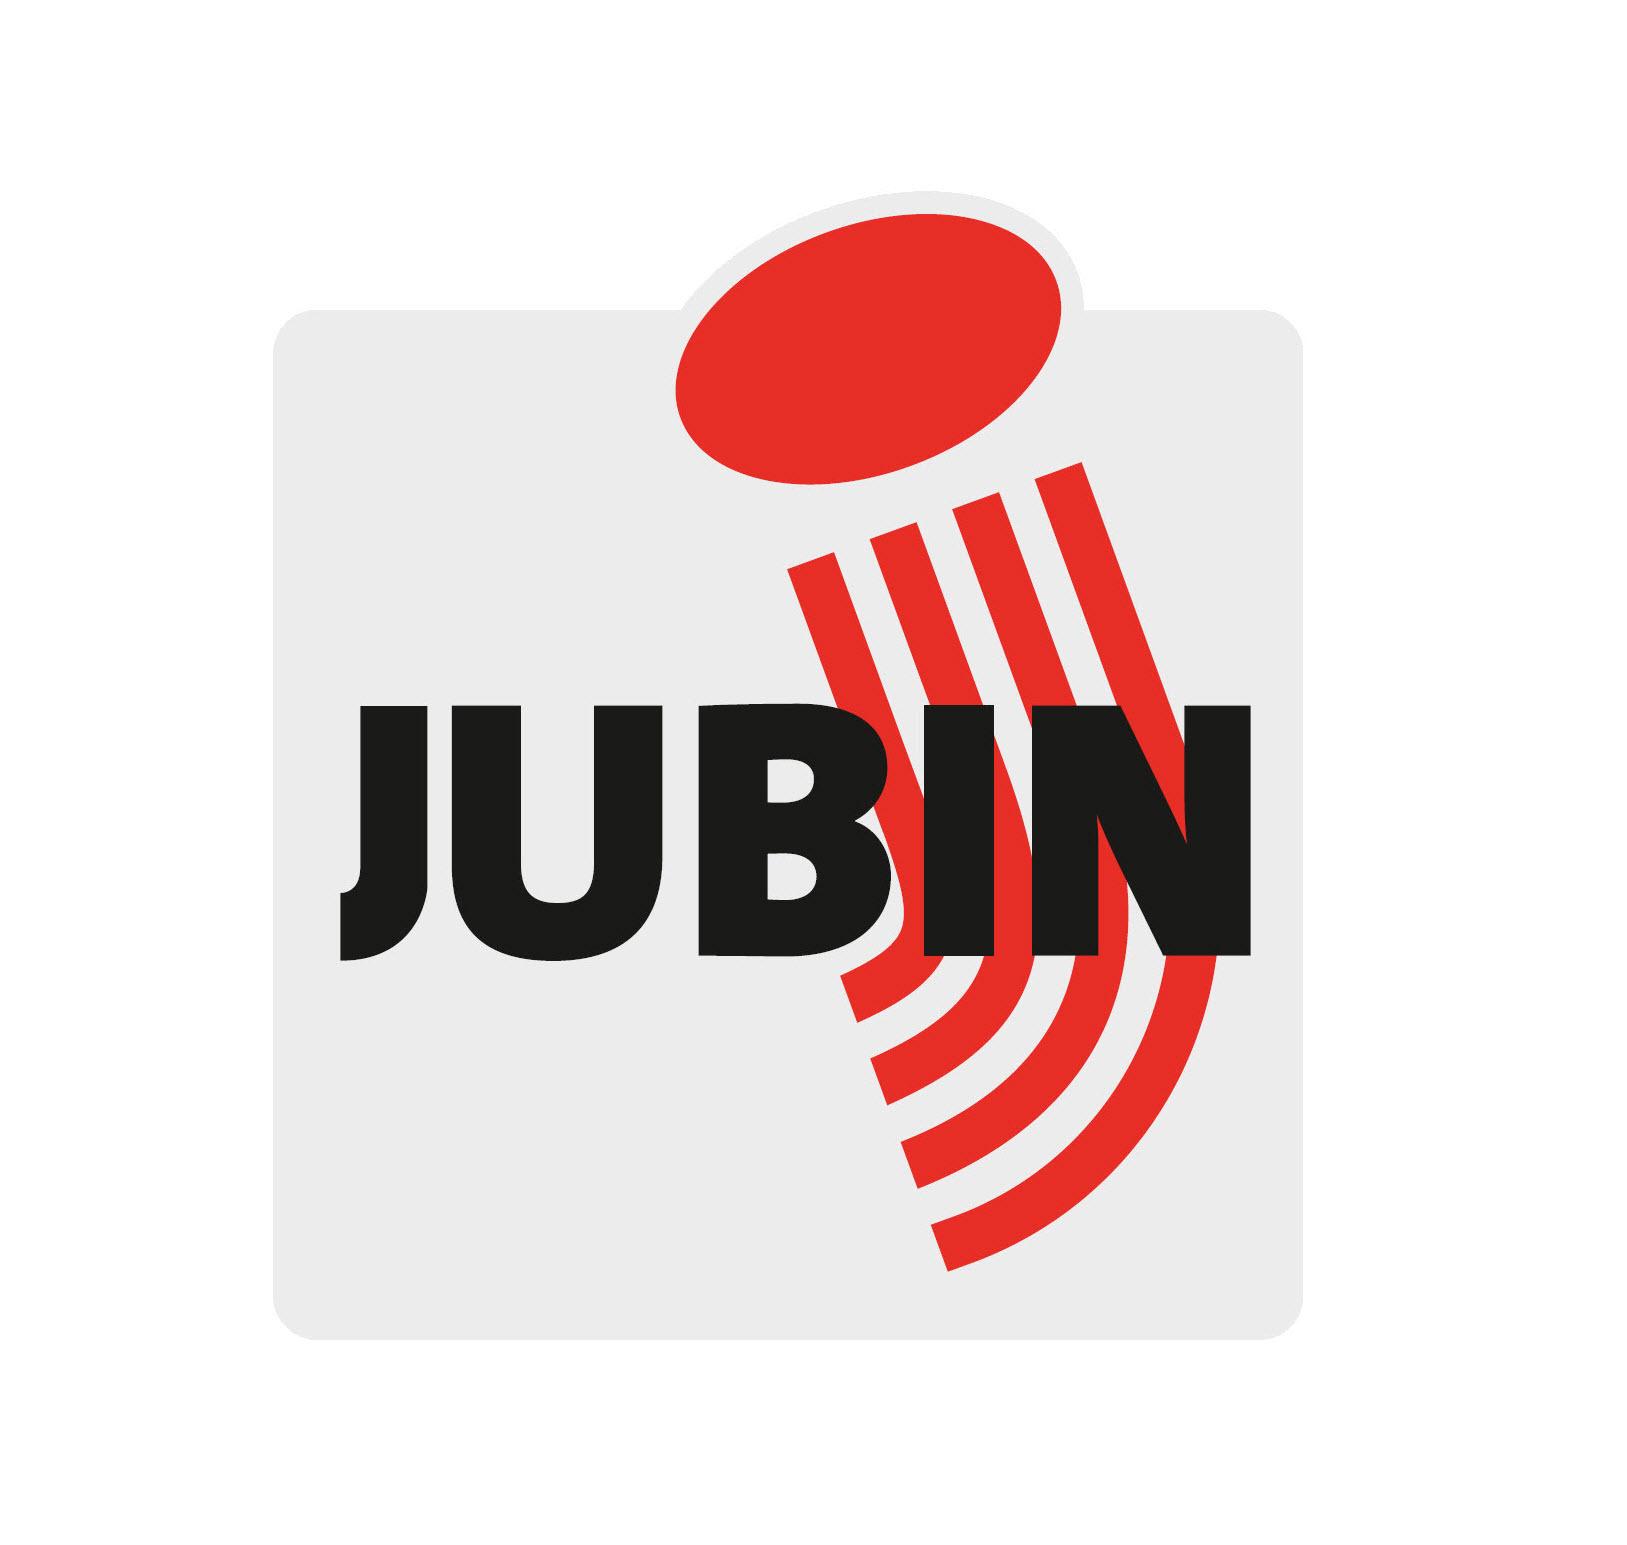 Logo Jubin Frères.